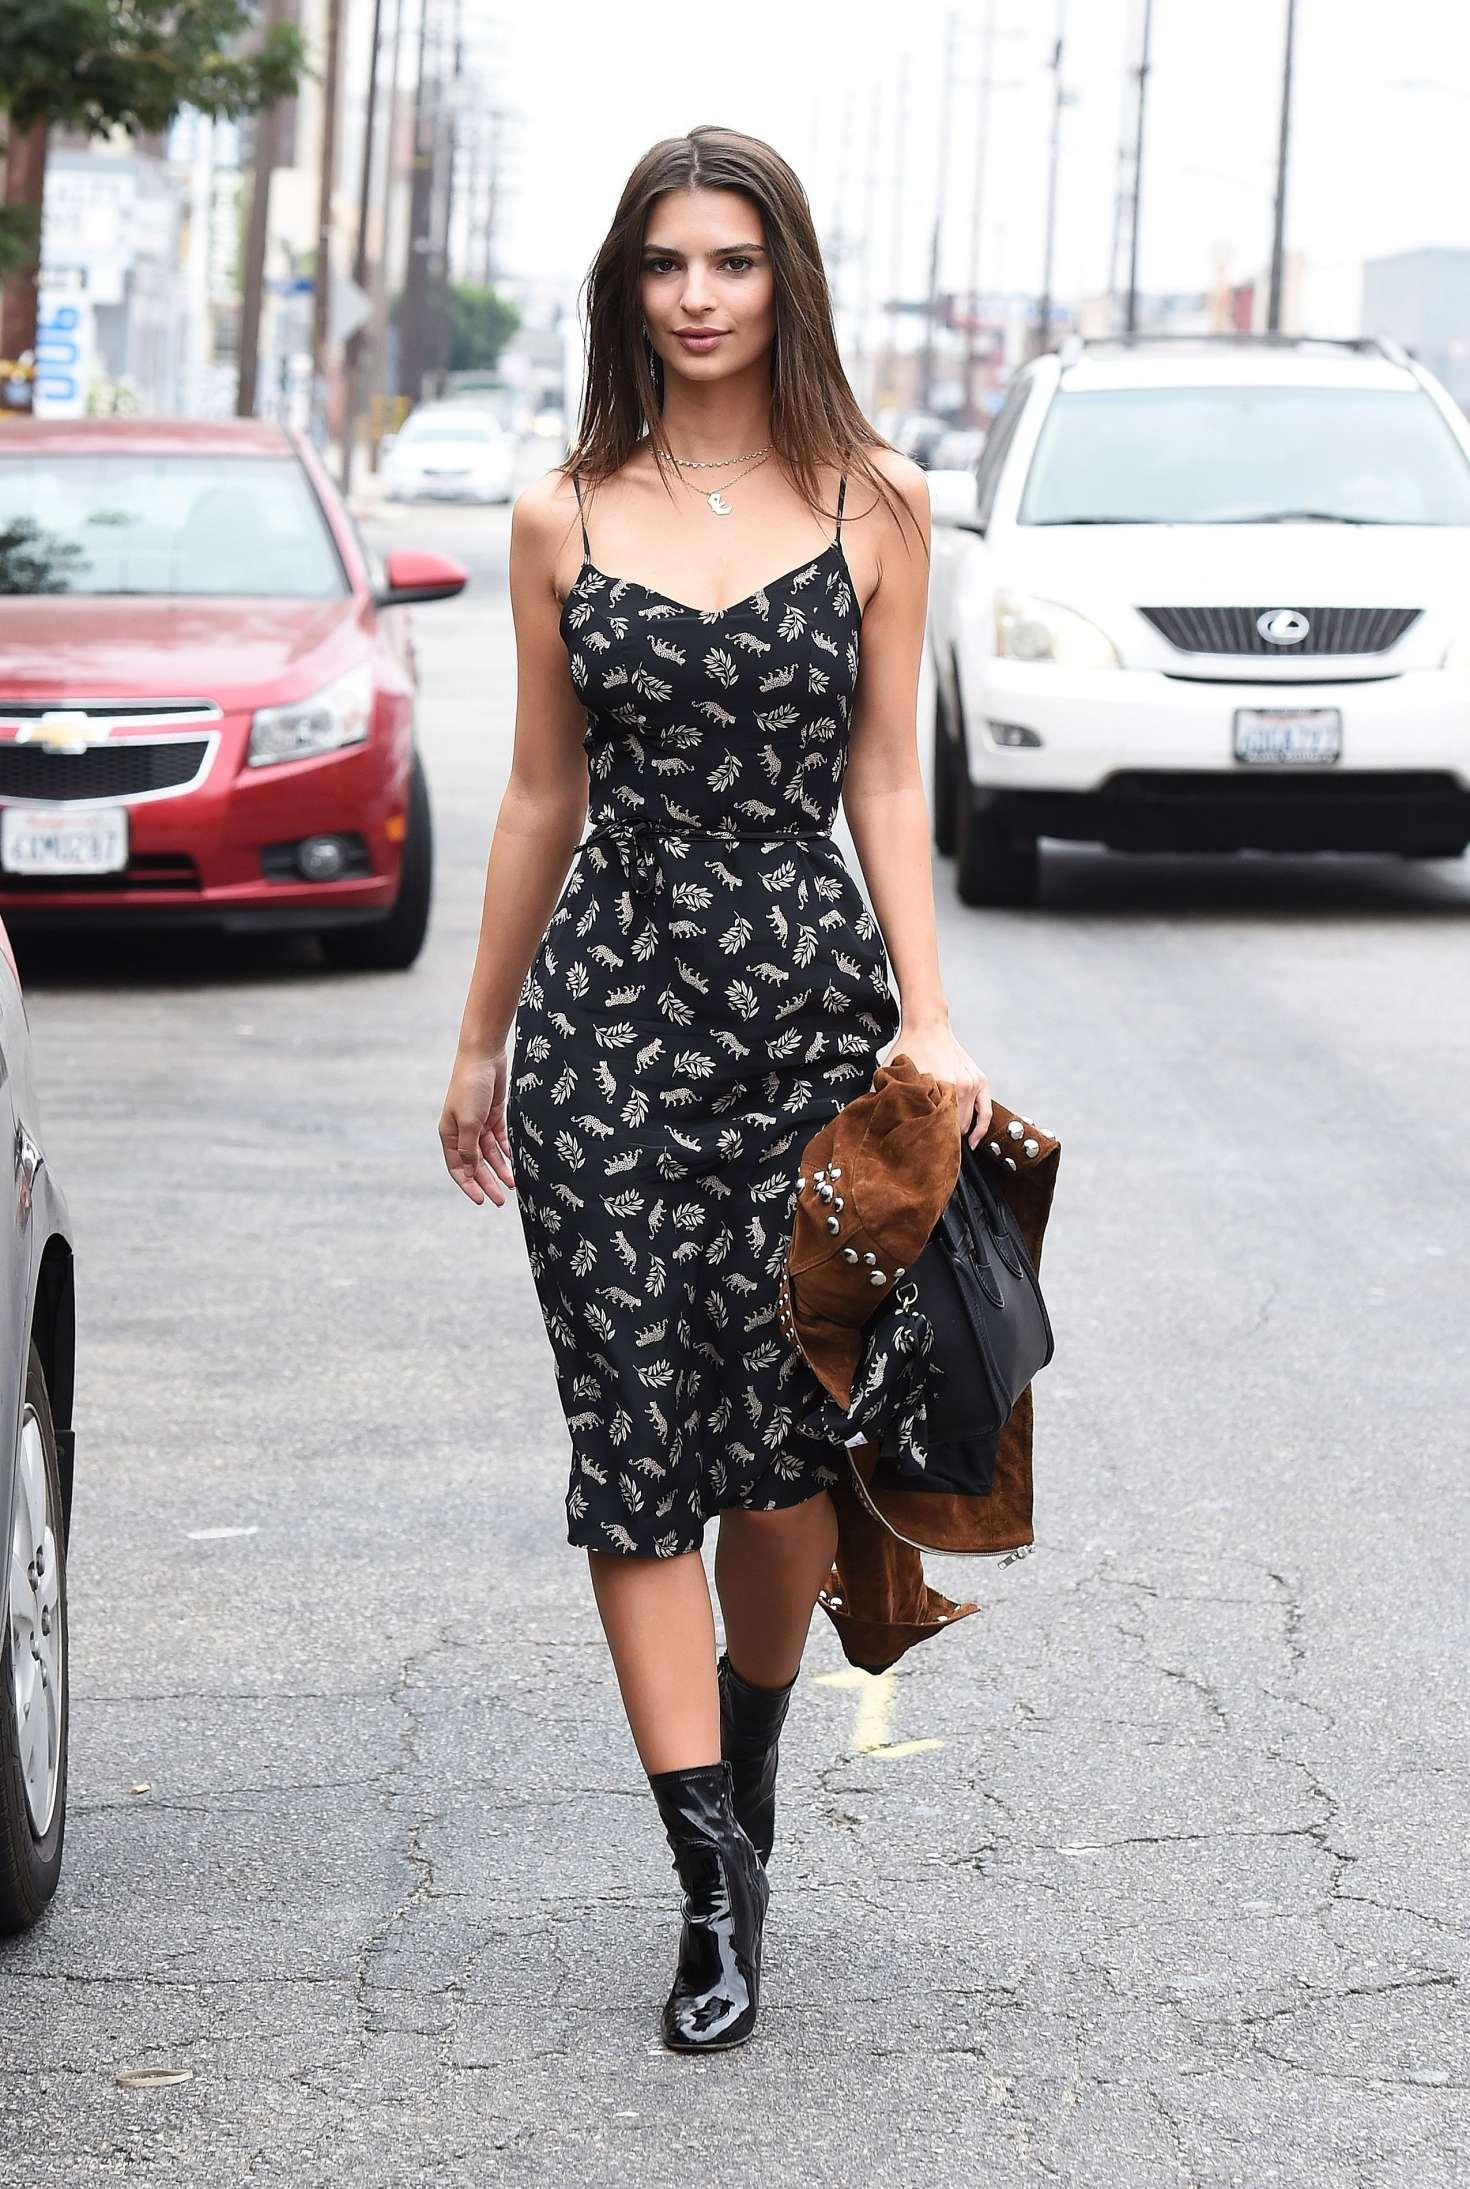 Emily Ratajkowski 2016 : Emily Ratajkowski in Summer Dress -09